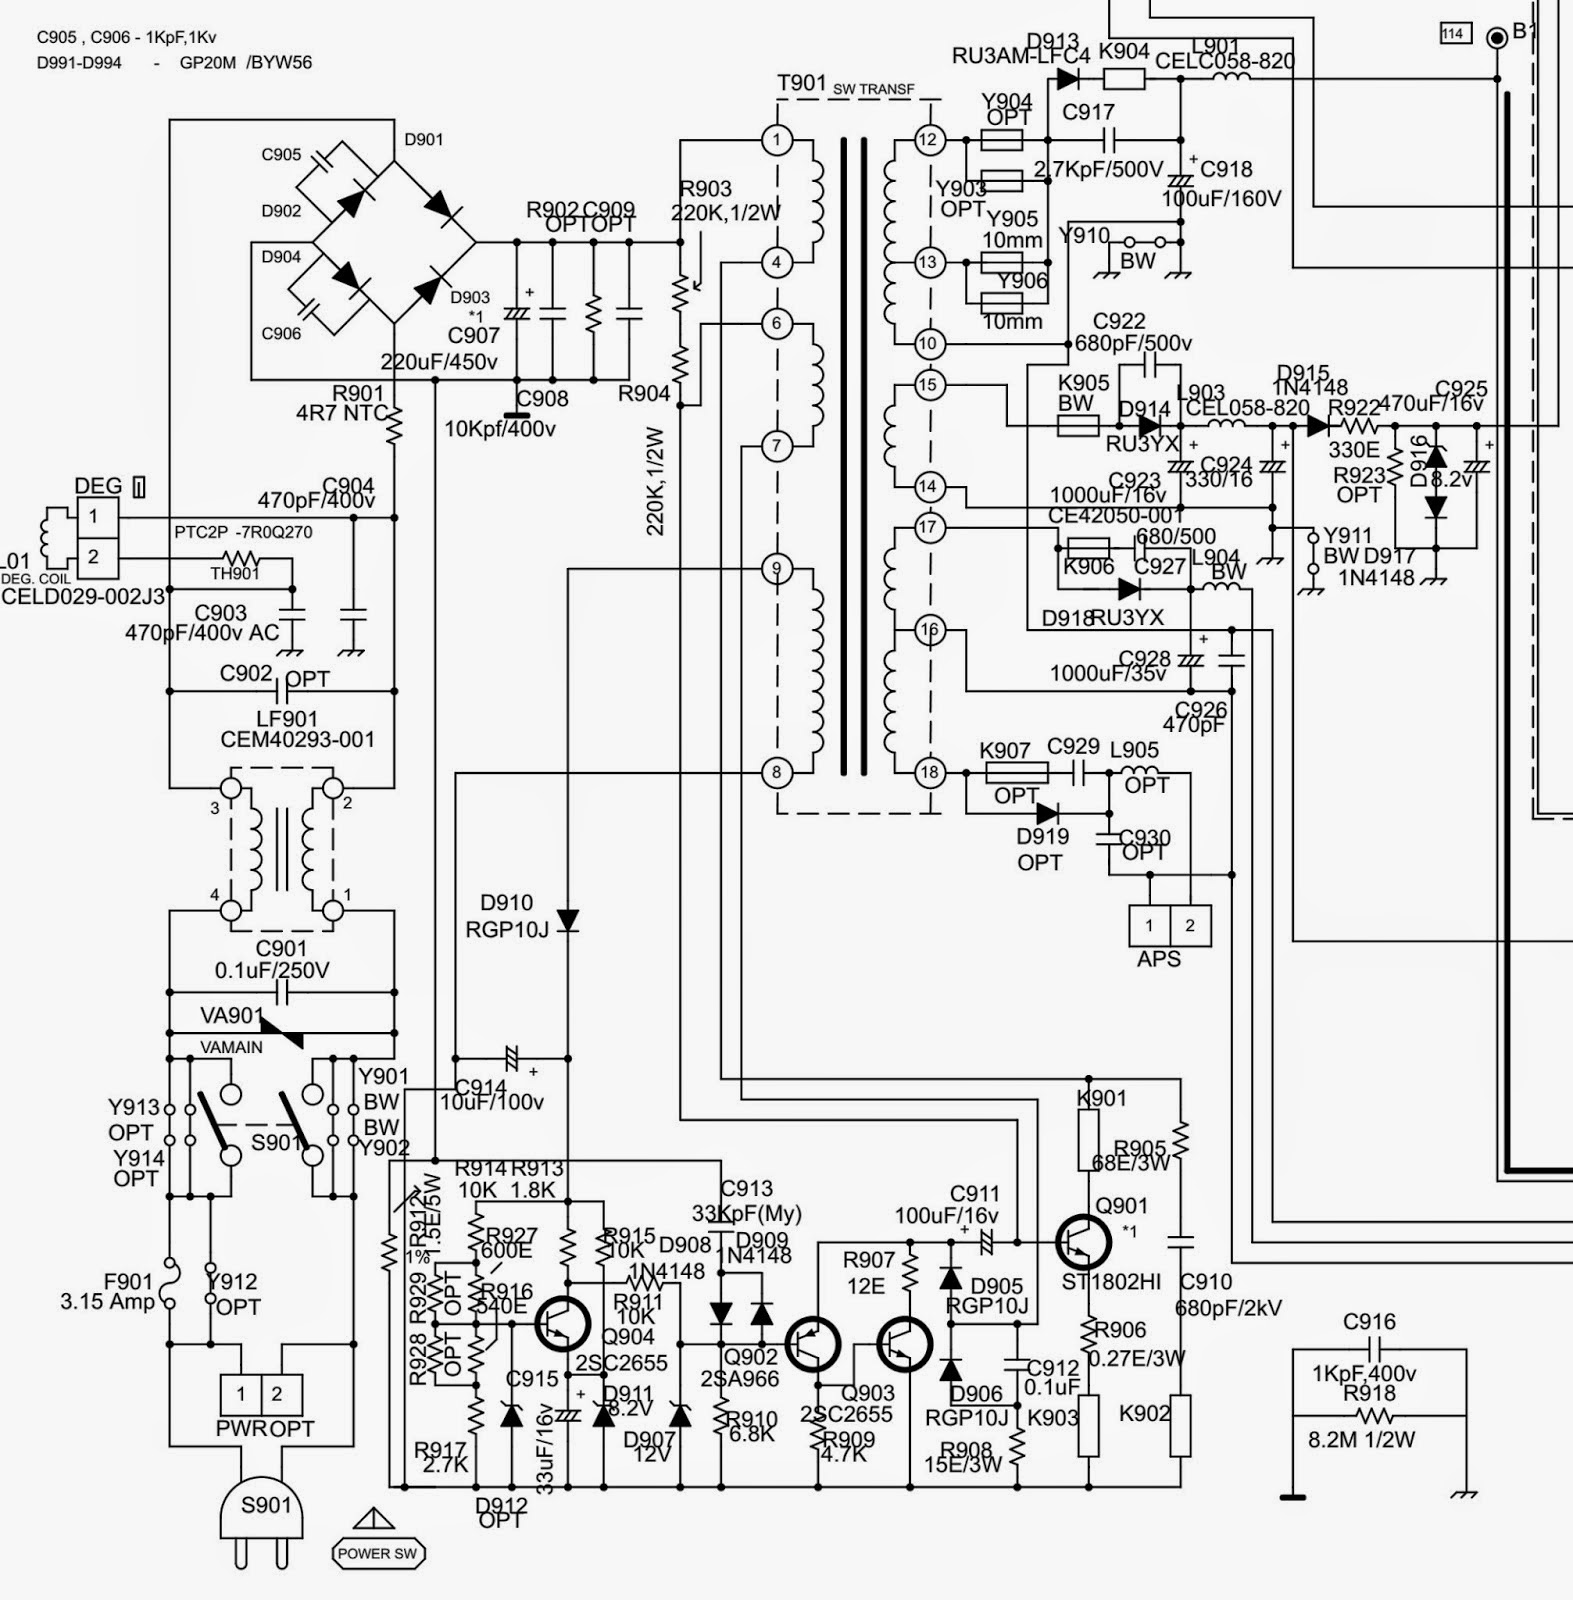 2001 Dodge Ram Wiring Diagram Free Picture Wiring Diagram Schematic